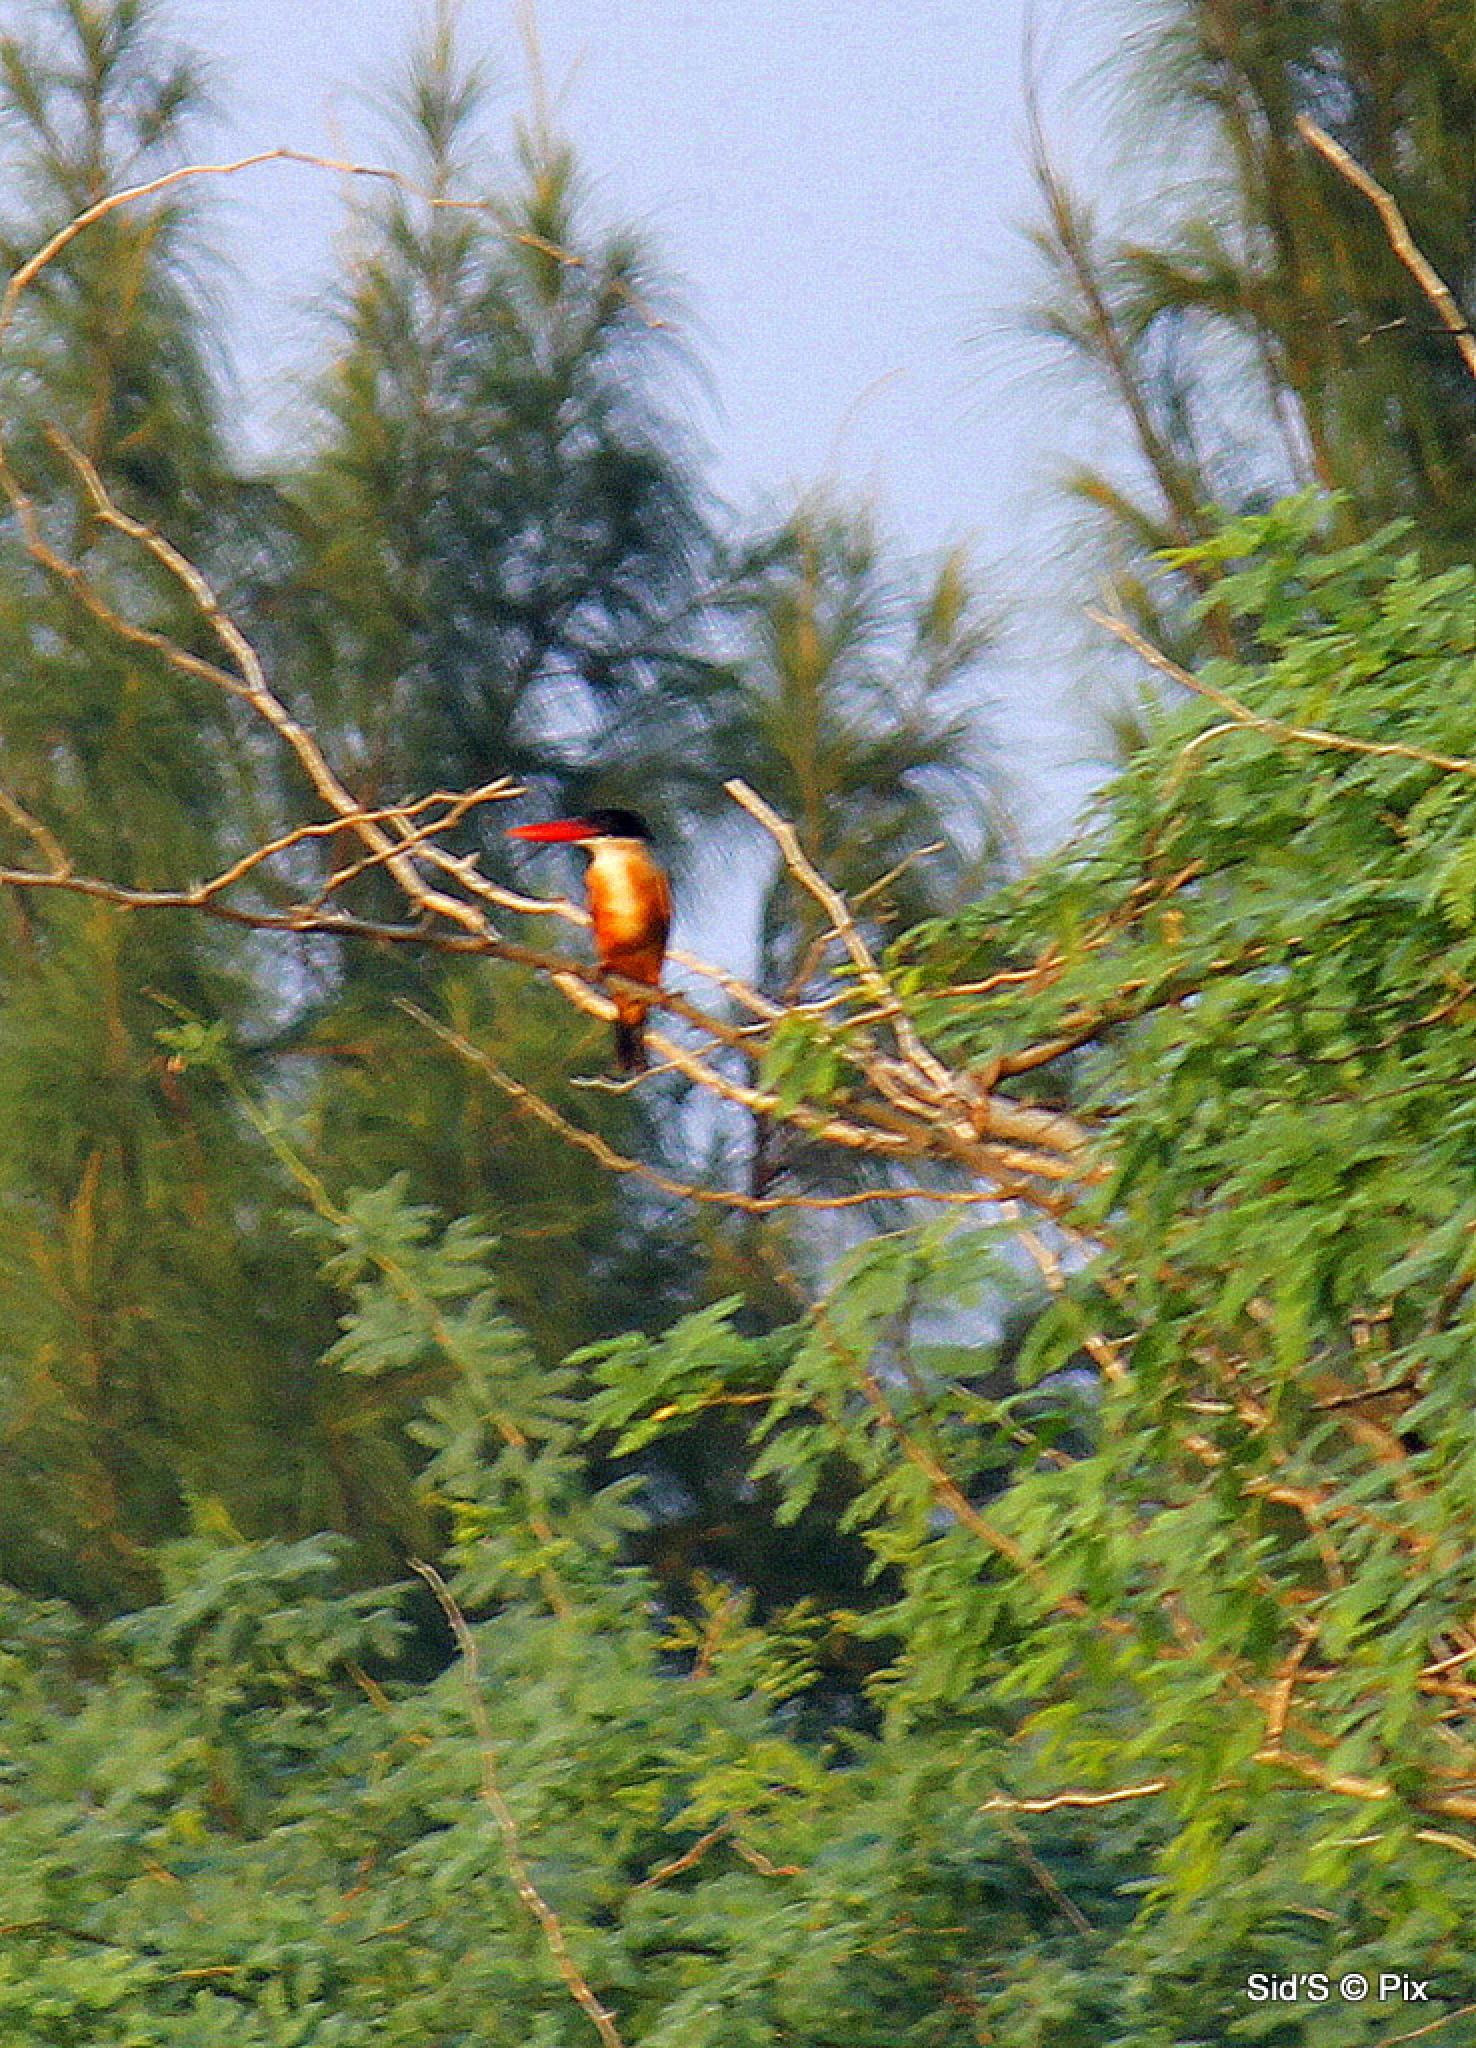 Bird on a Tree by Siddharth Sanyal